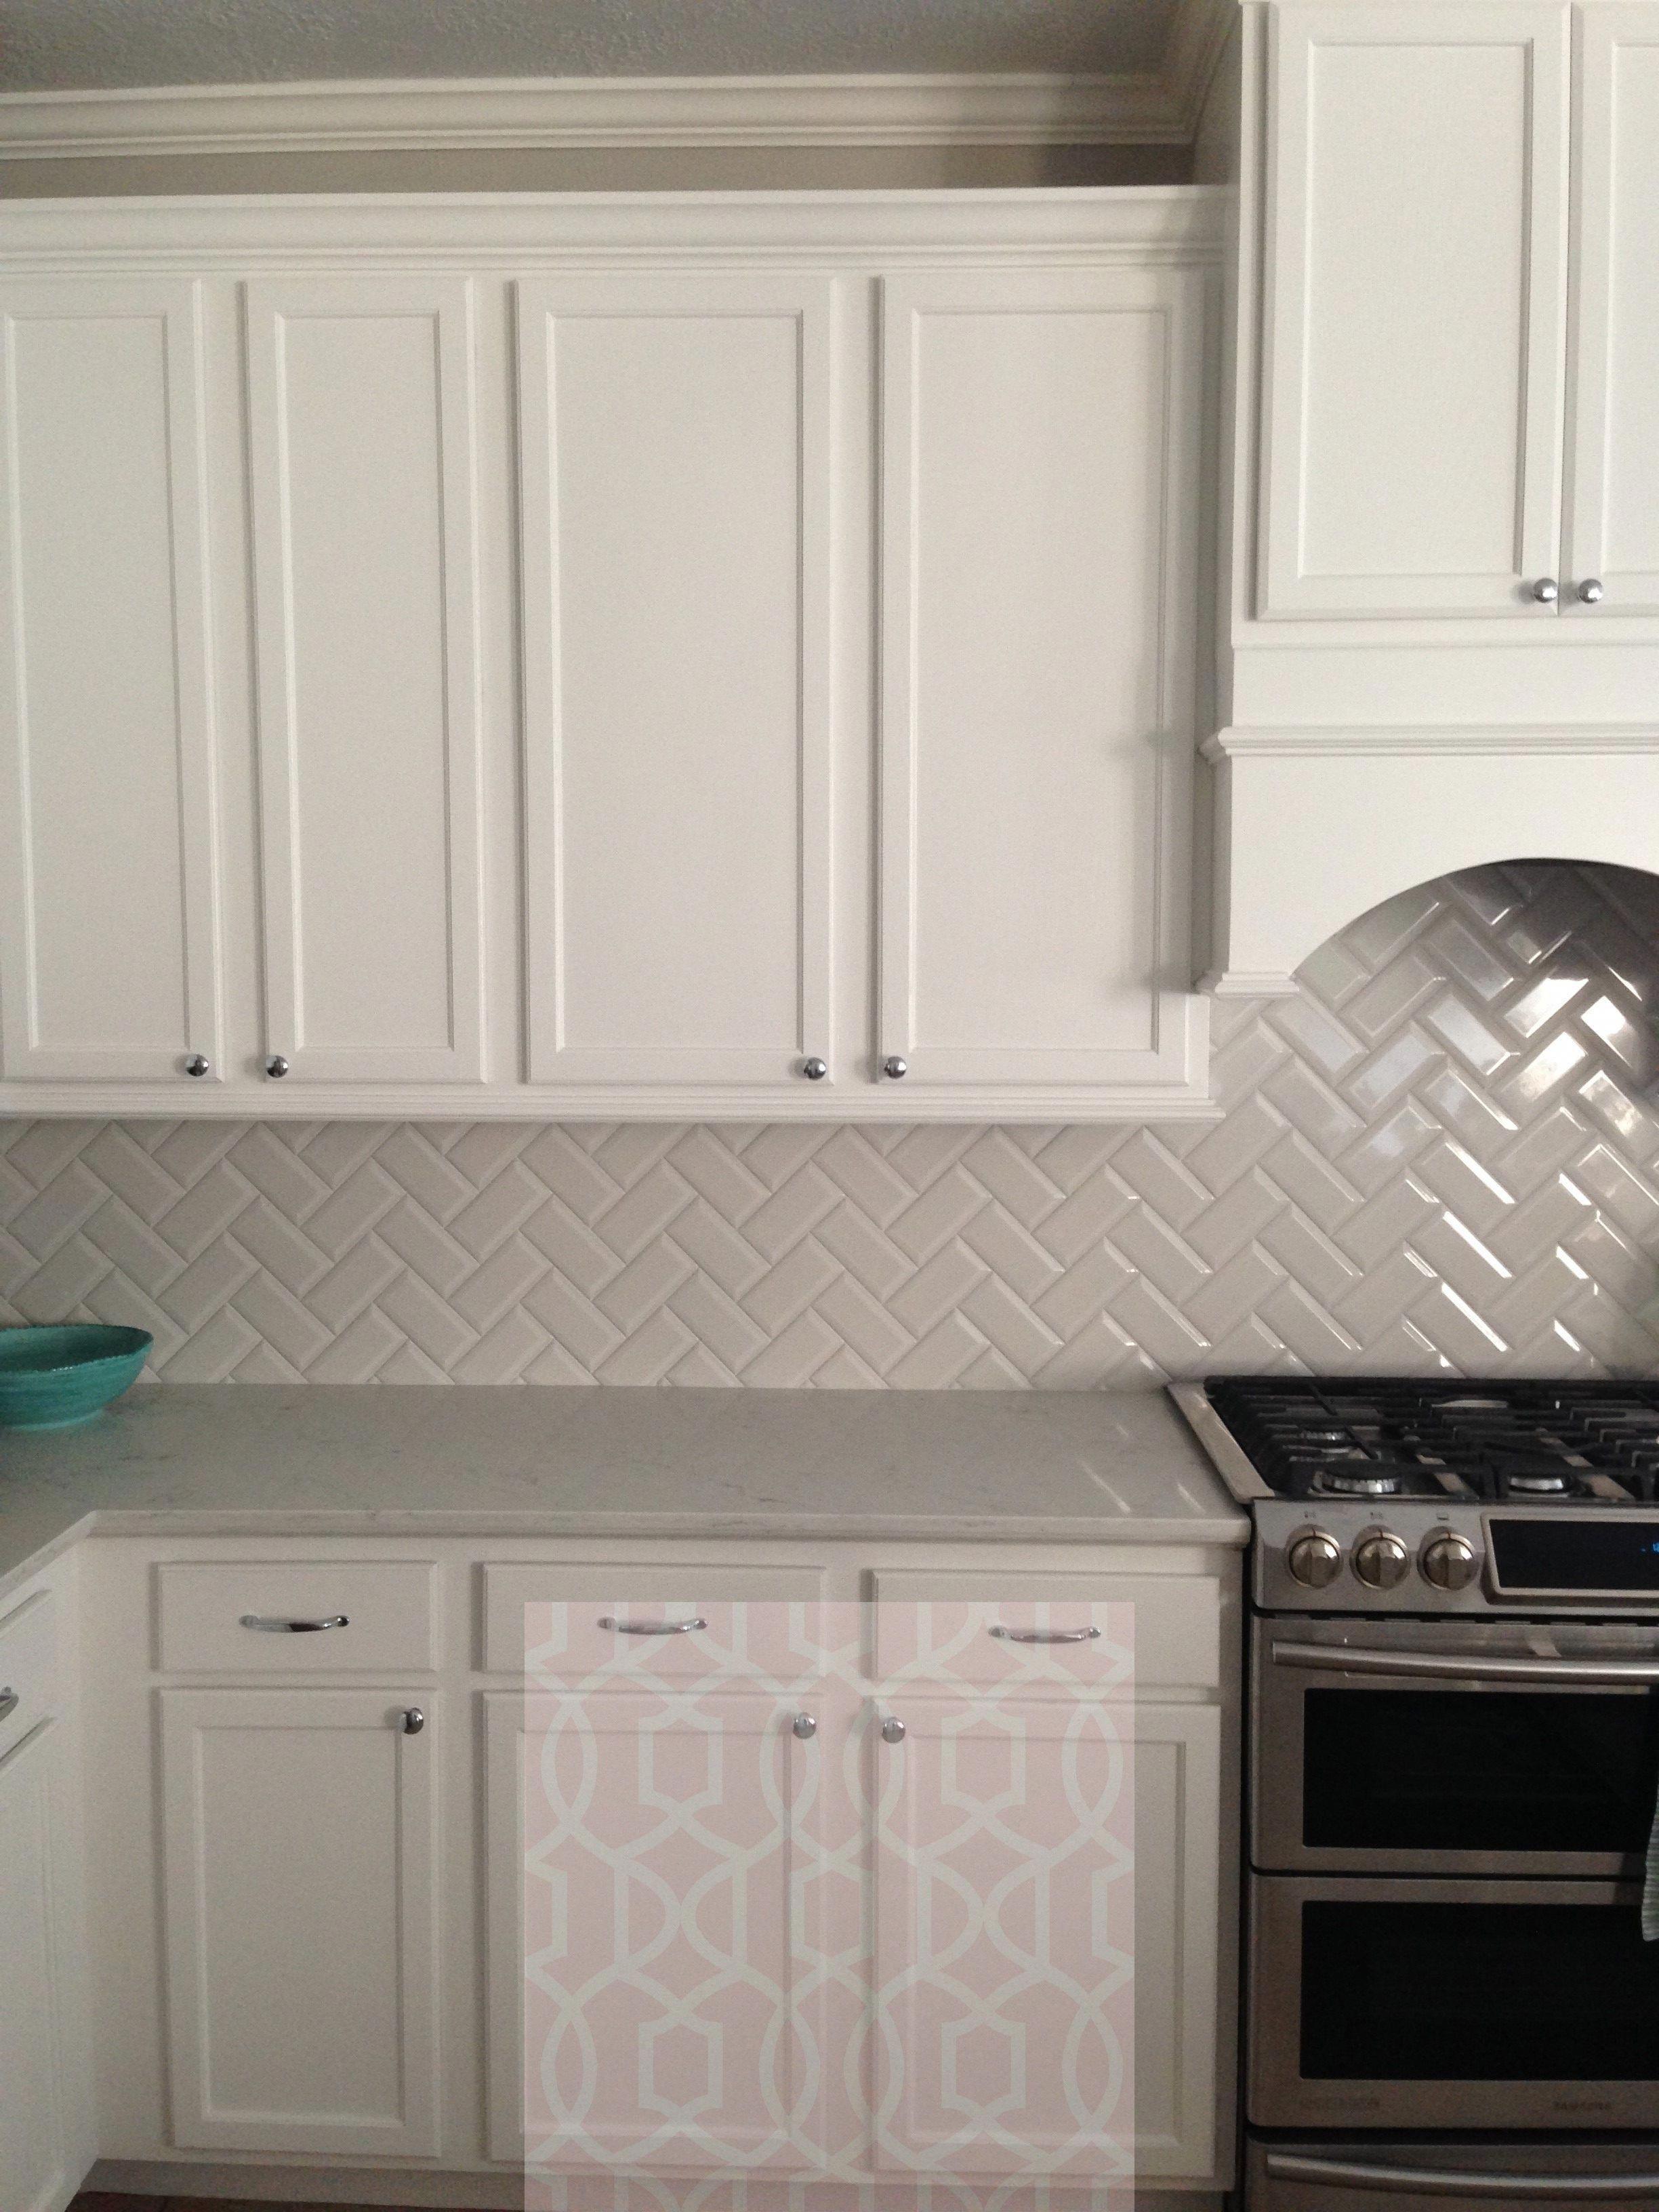 Ridiculous Tips And Tricks Backsplash Ideas With Granite Countertops Blue Marble Backsplash Kitchen Tiles Backsplash Kitchen Backsplash Herringbone Backsplash